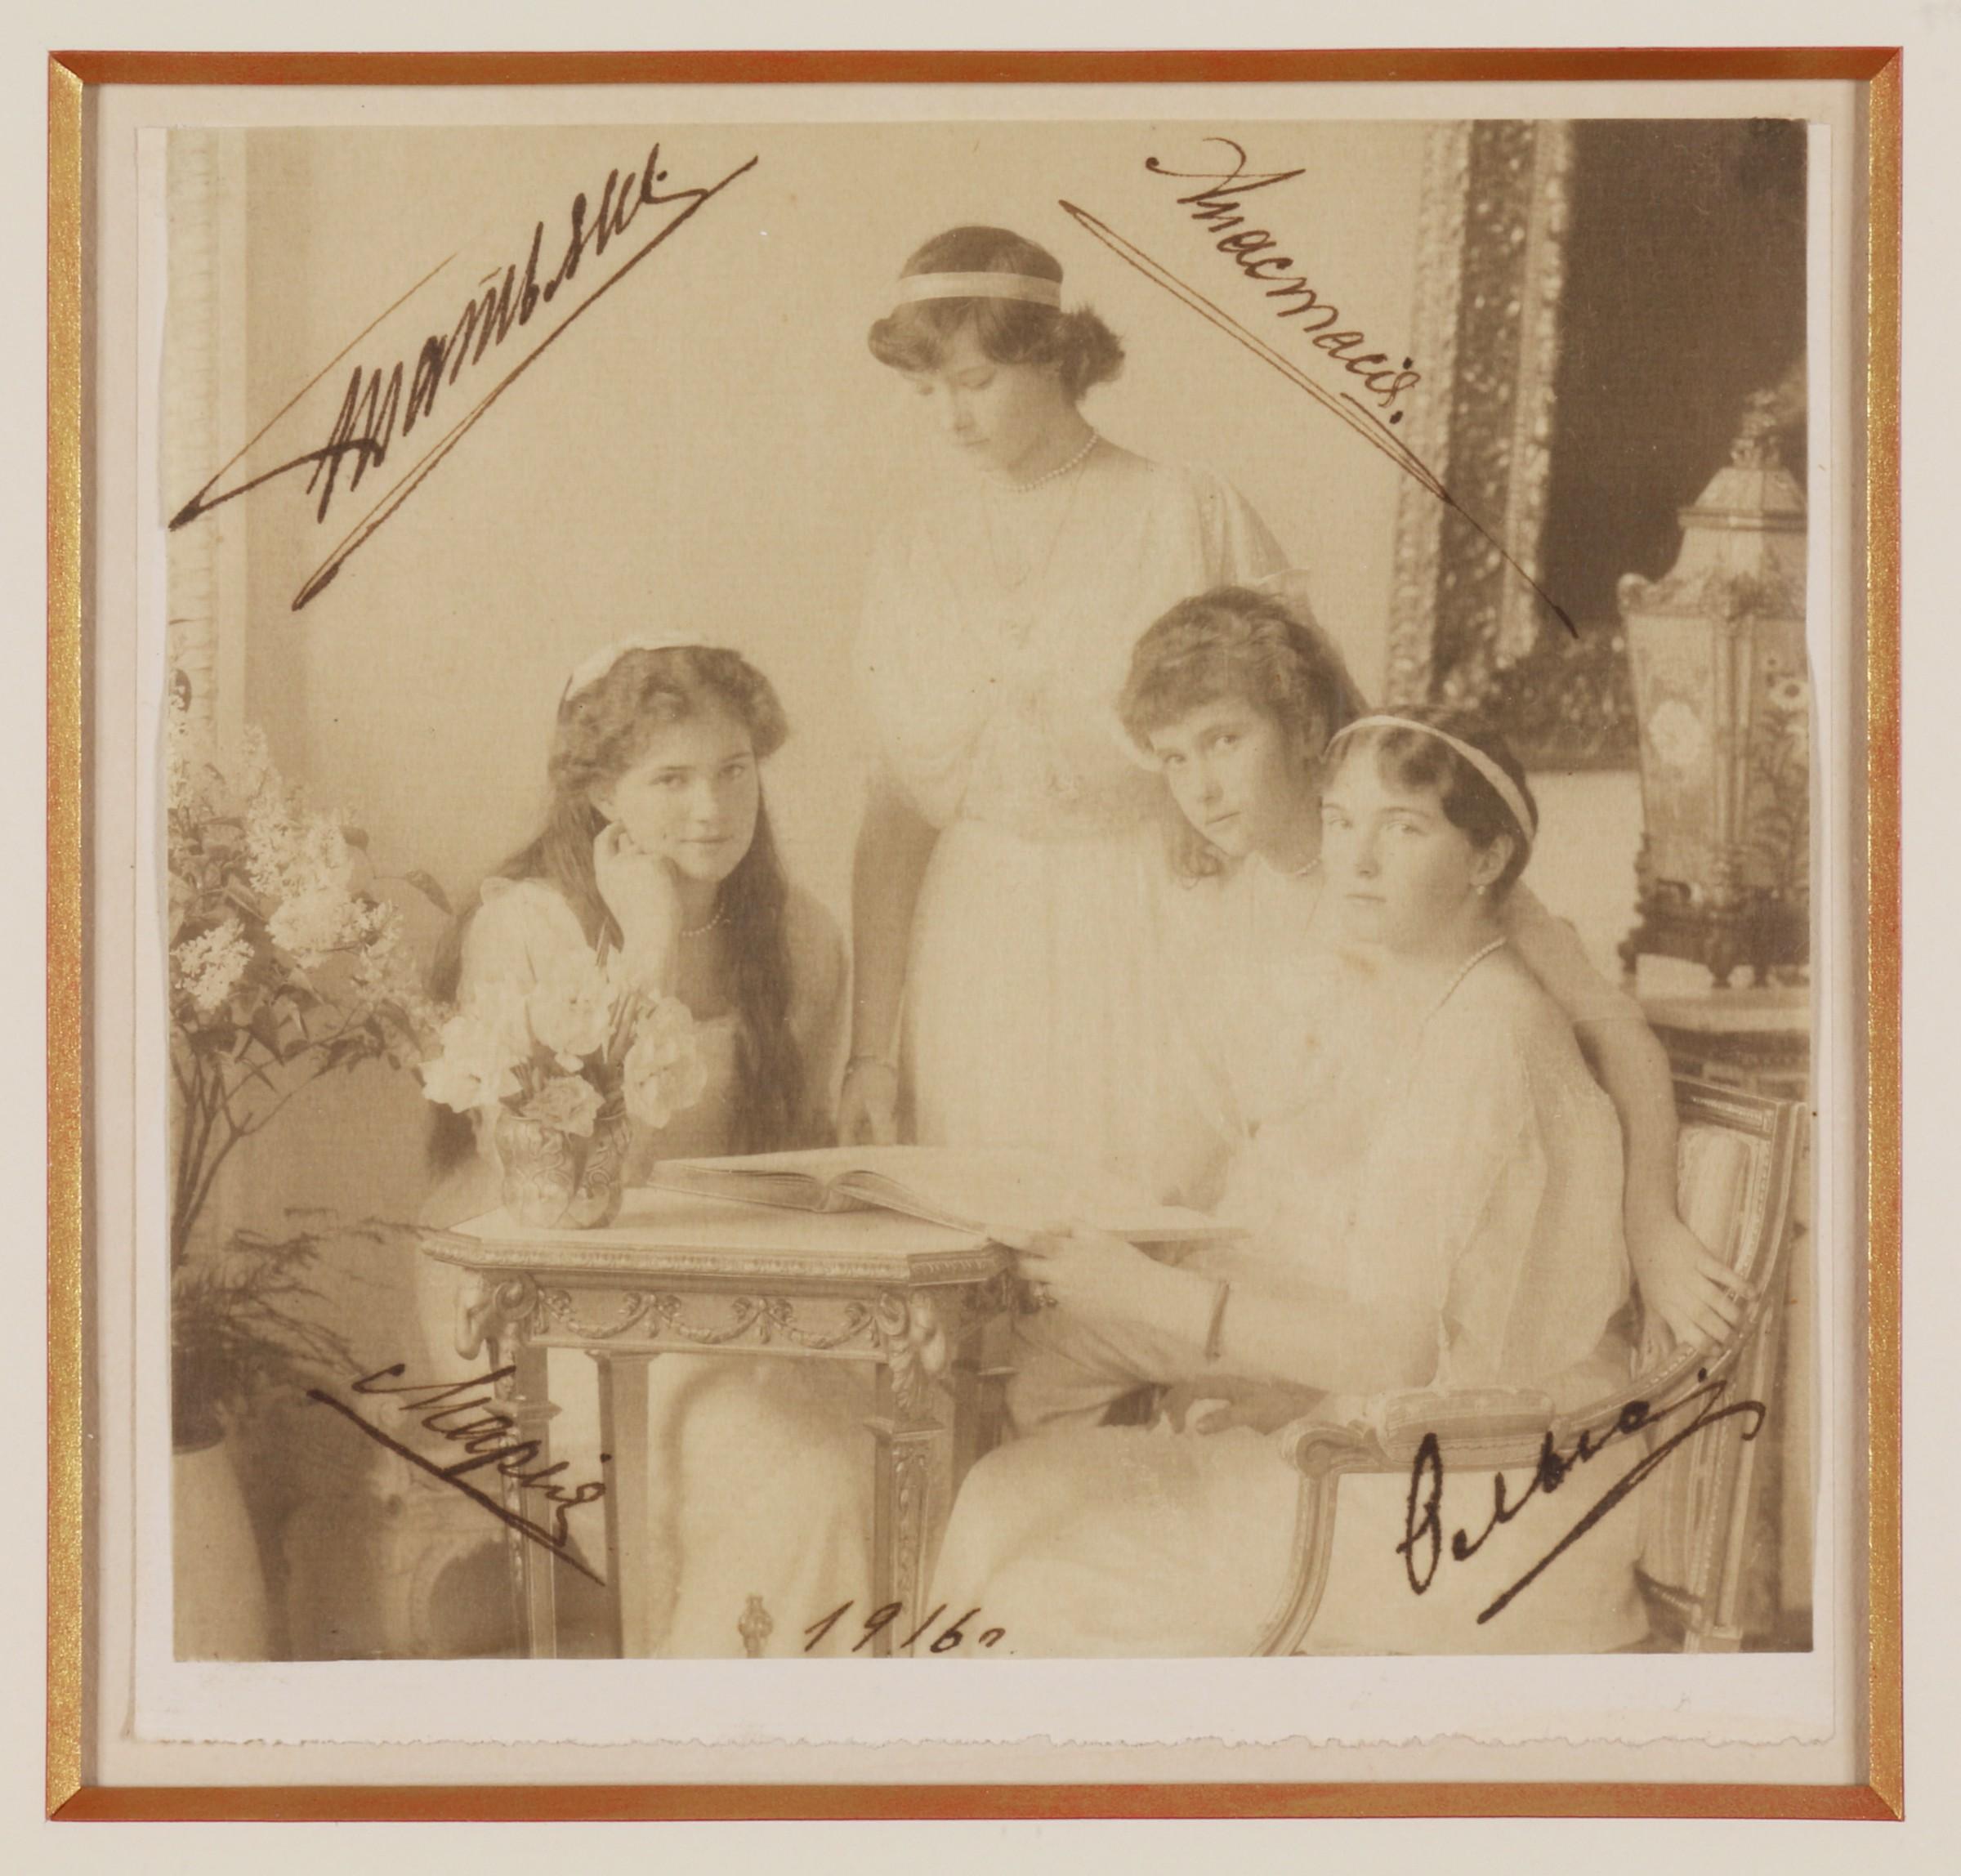 Vintage FOUND PHOTOGRAPH Color FREE SHIPPING Original Snapshot 71 26